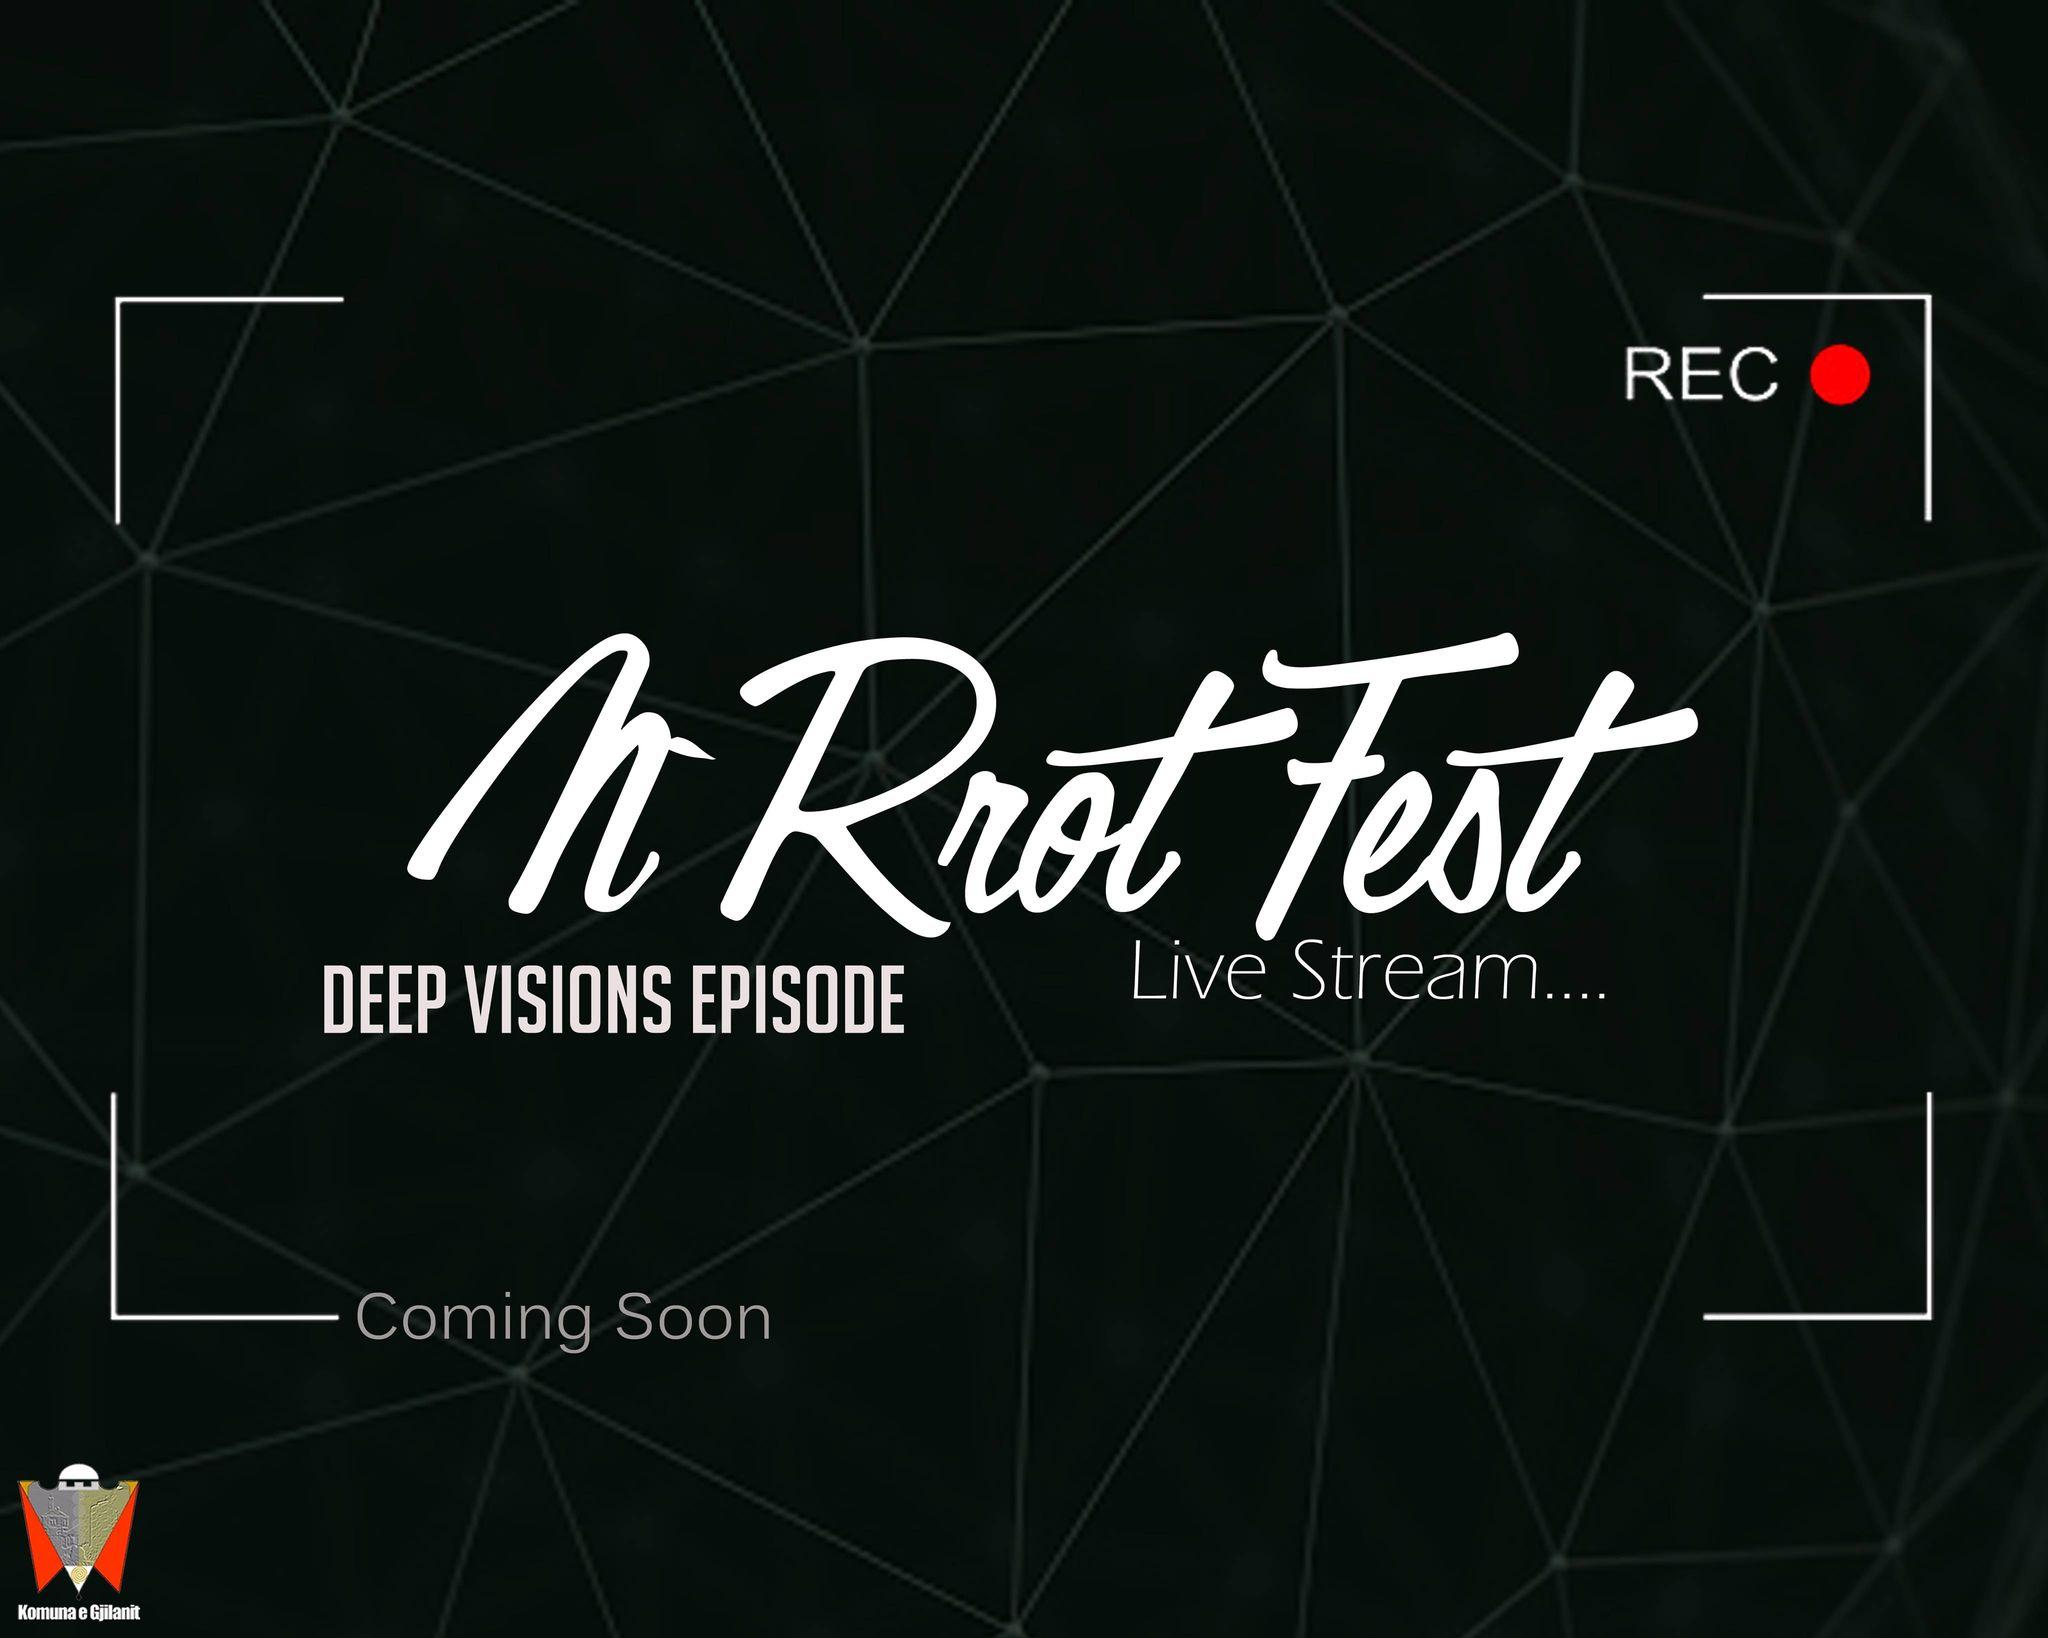 """N'Rrot Fest"" po vjen, edicioni i ri sjell befasi"